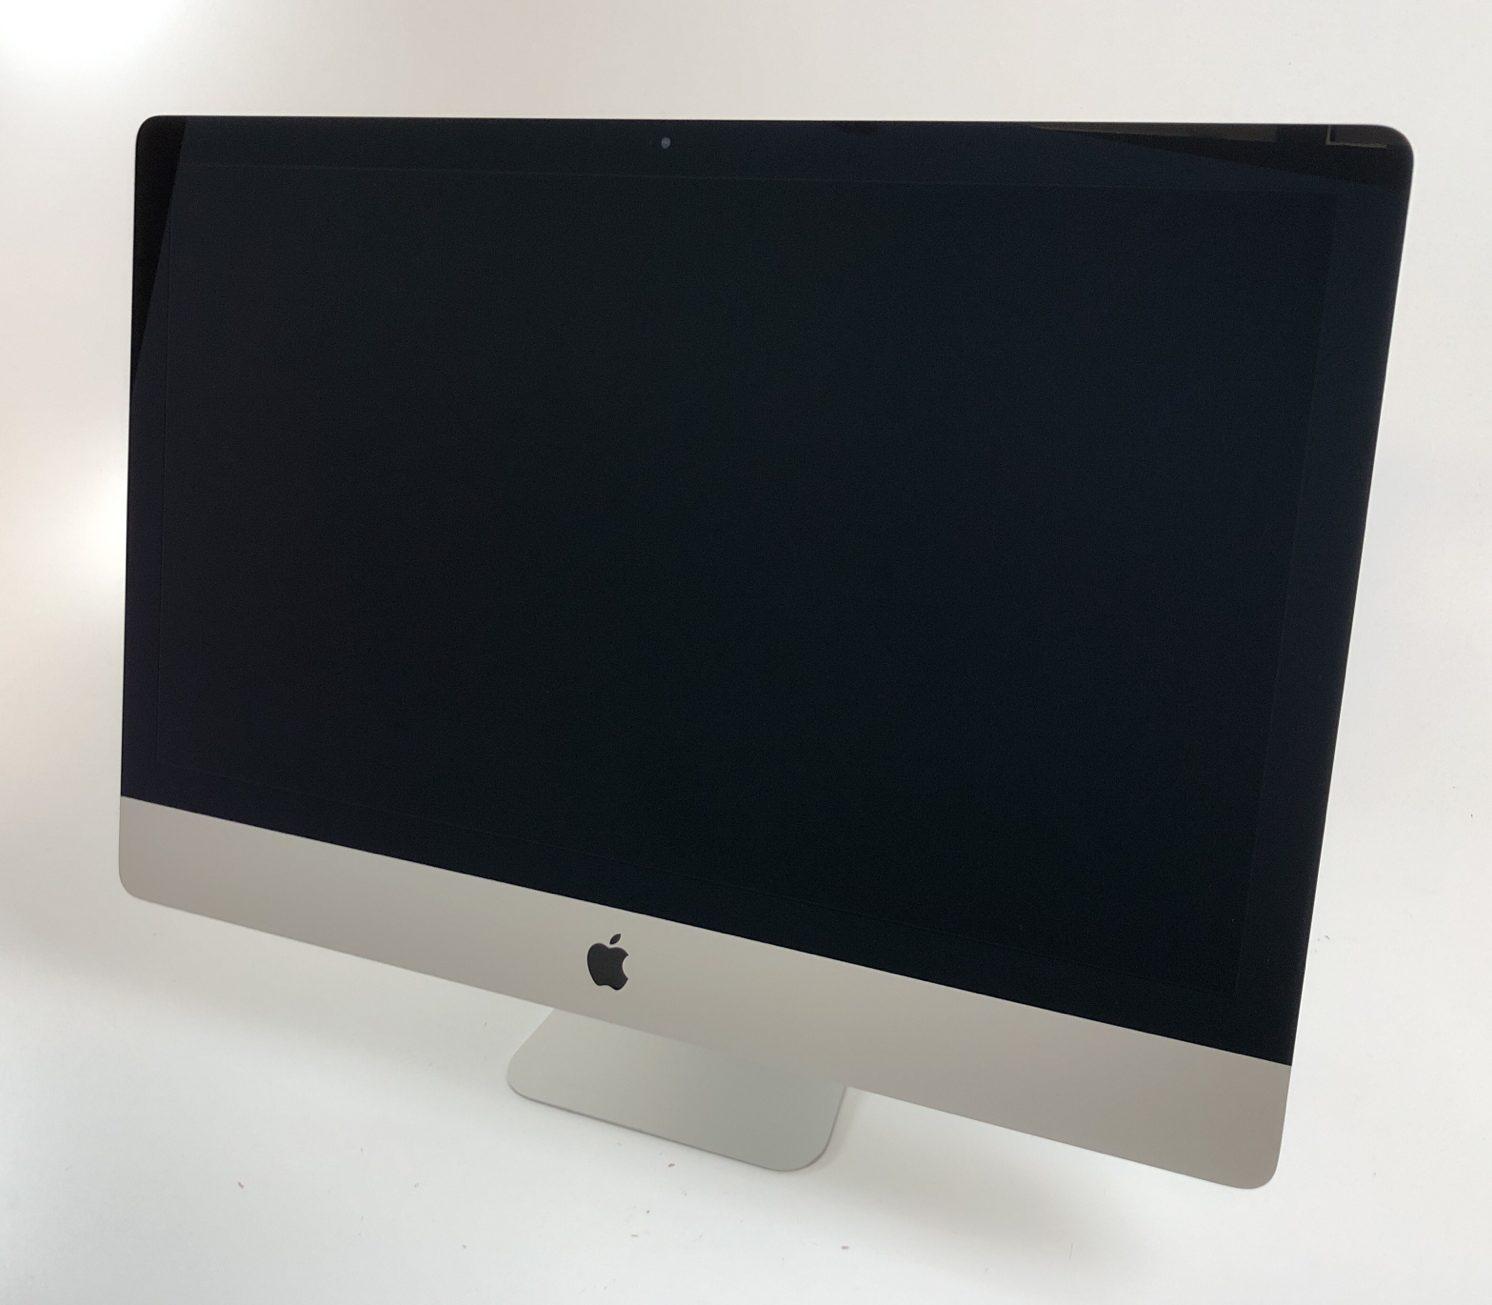 "iMac 27"" Late 2013 (Intel Quad-Core i7 3.5 GHz 32 GB RAM 1 TB Fusion Drive), Intel Quad-Core i7 3.5 GHz, 32 GB RAM, 1 TB Fusion Drive, Kuva 1"